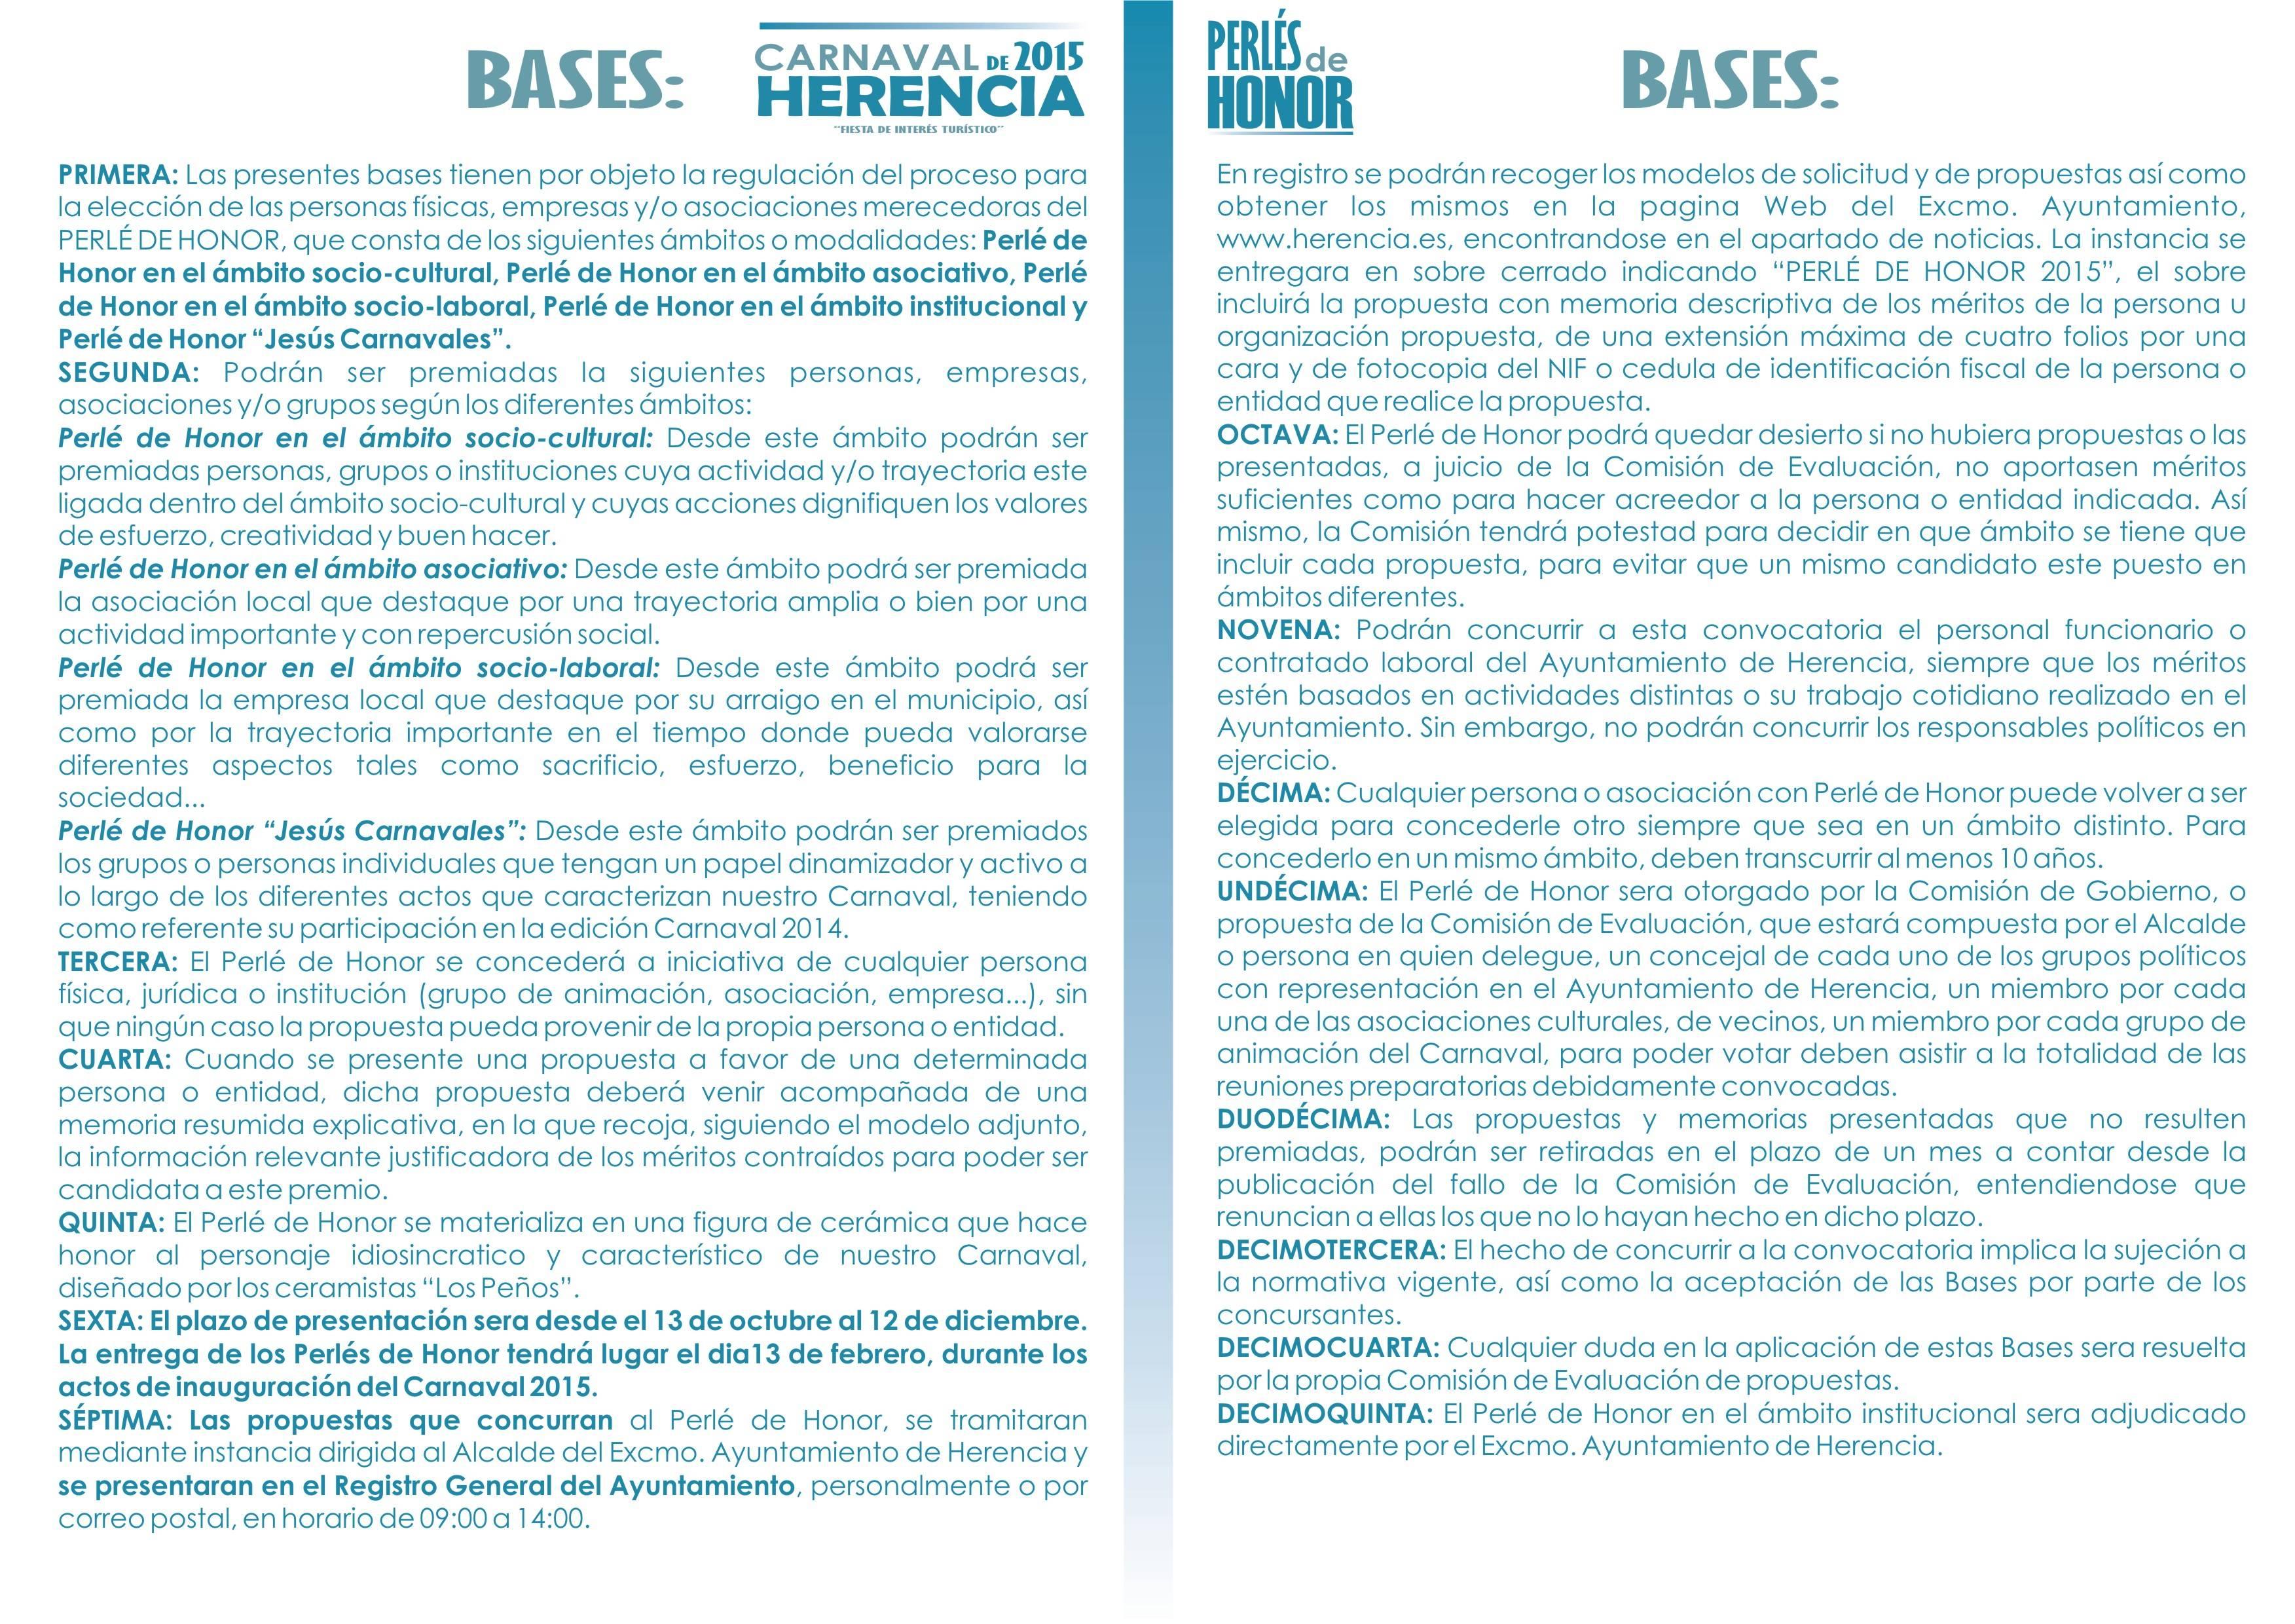 bases perles de honor carnaval de herencia 2015 - El Carnaval de Herencia busca propuestas para sus Perlés de Honor 2015